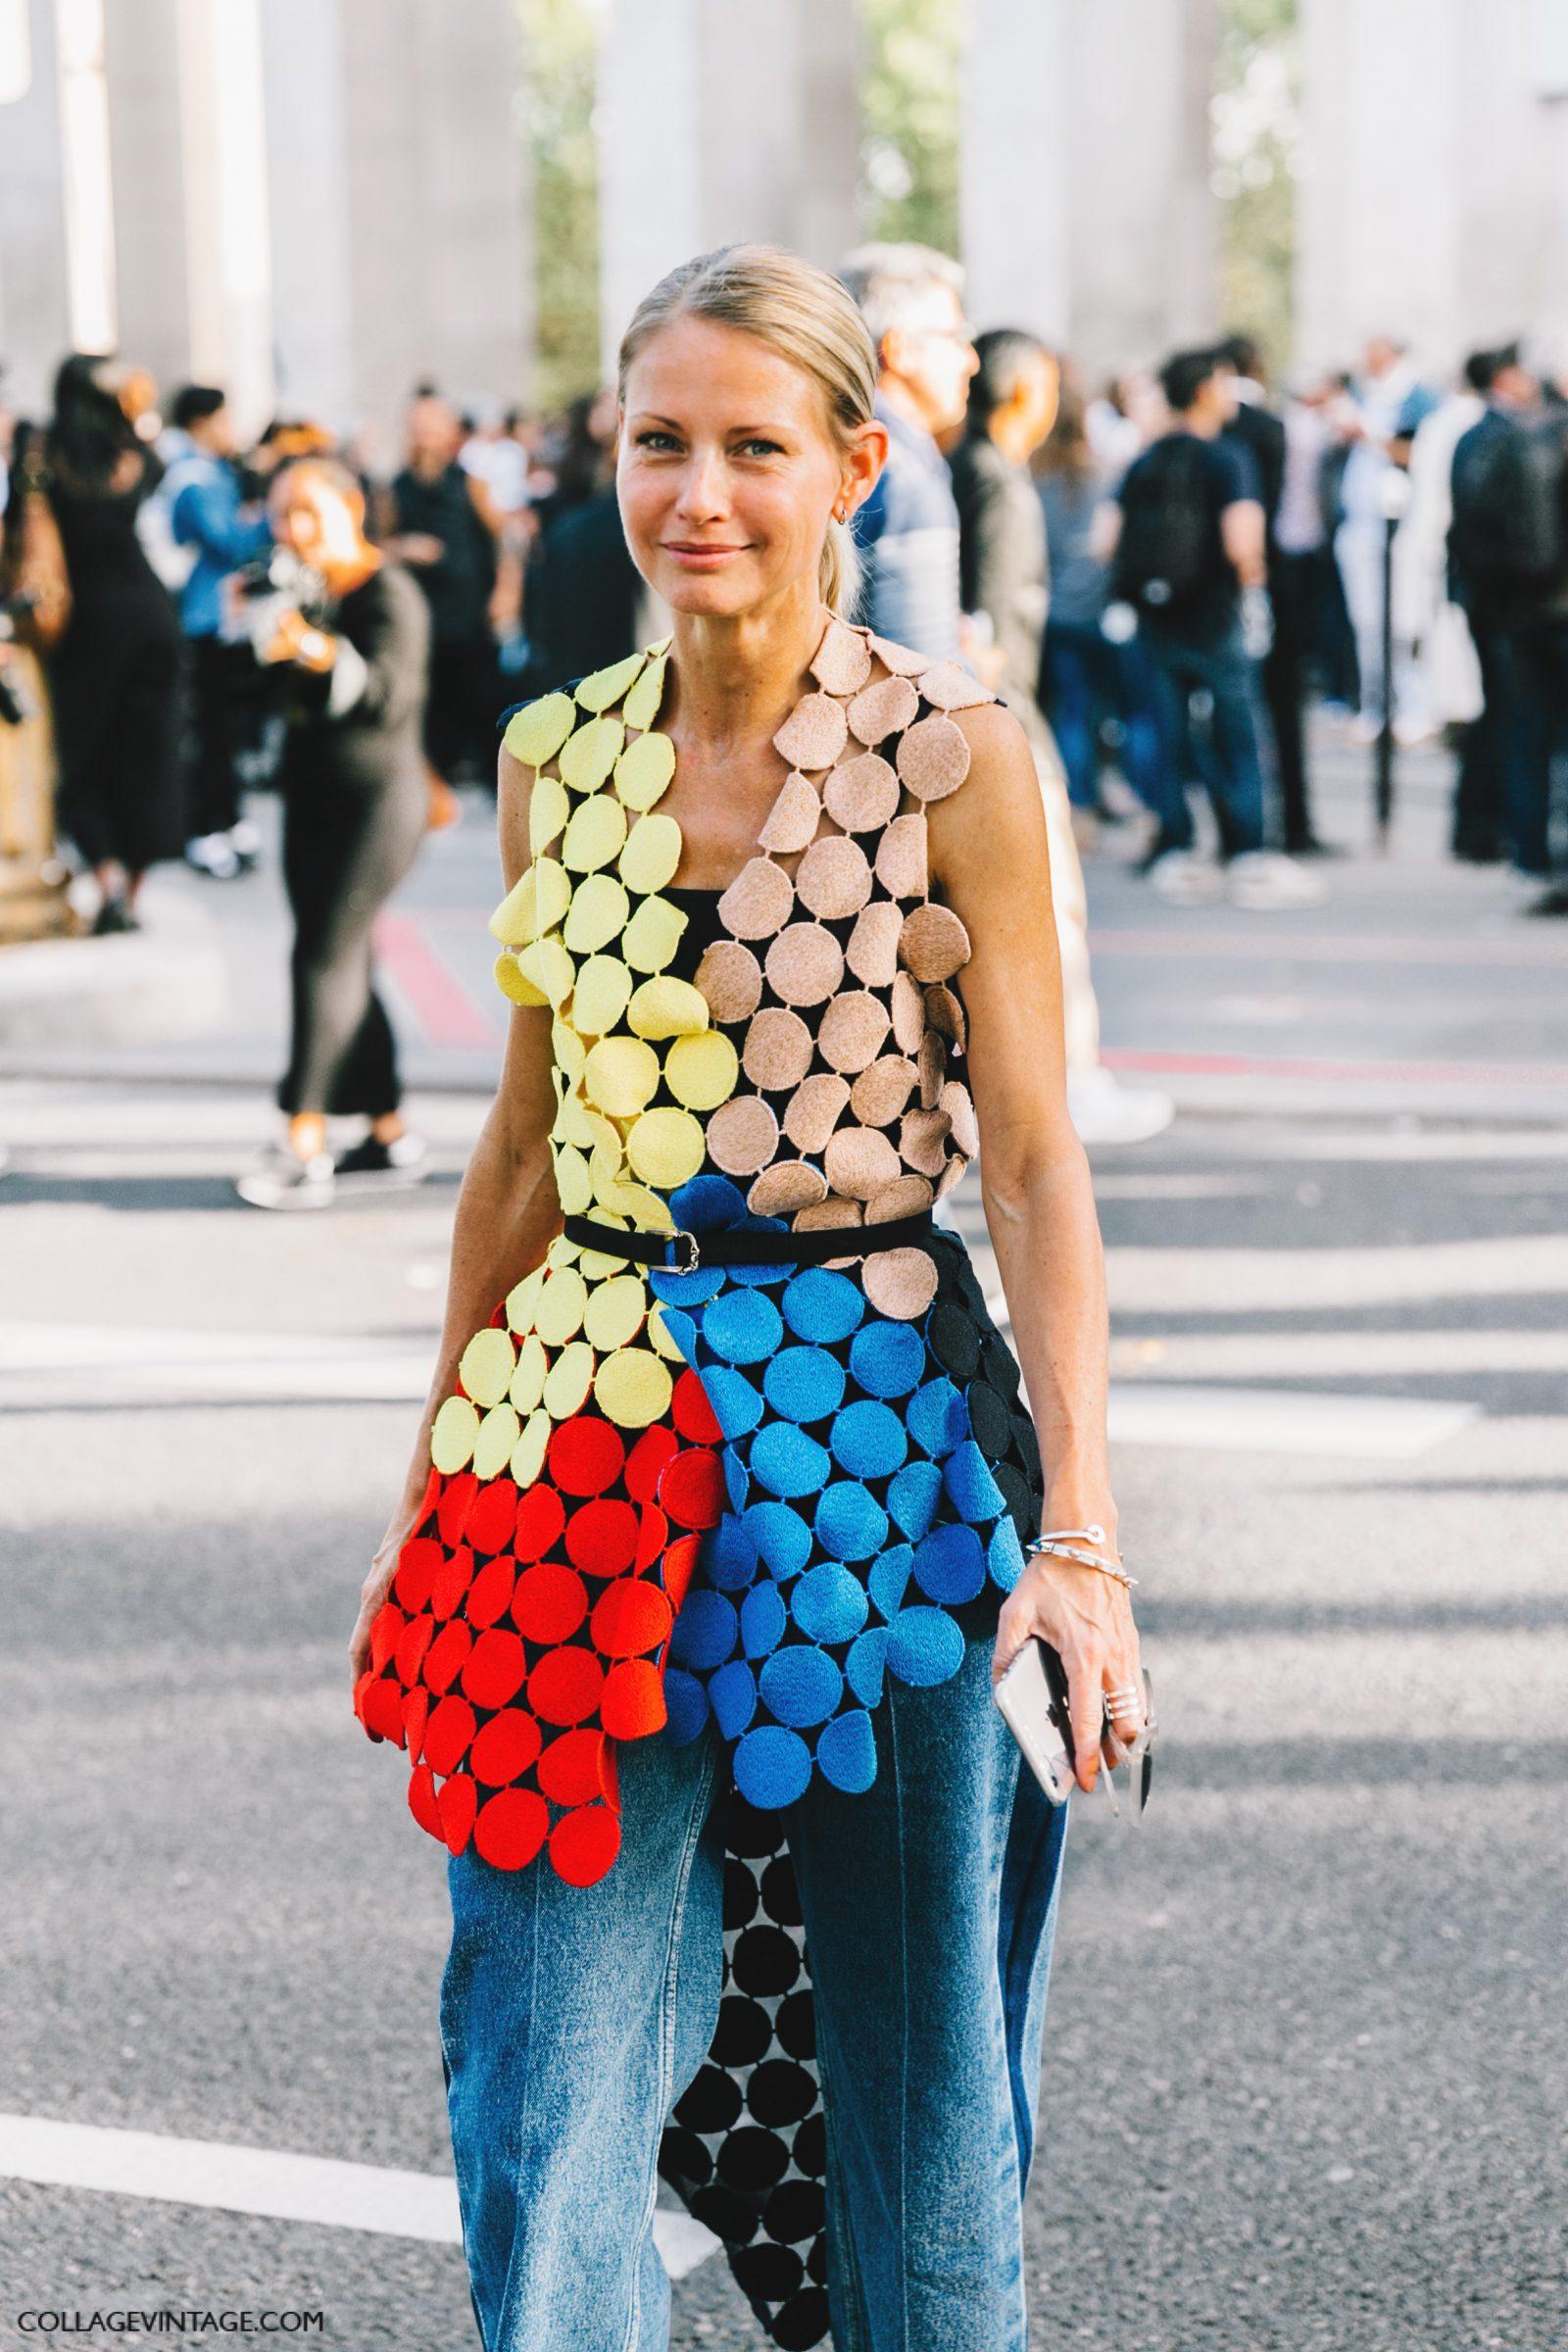 pfw-paris_fashion_week_ss17-street_style-outfits-collage_vintage-rochas-courreges-dries_van_noten-lanvin-guy_laroche-211